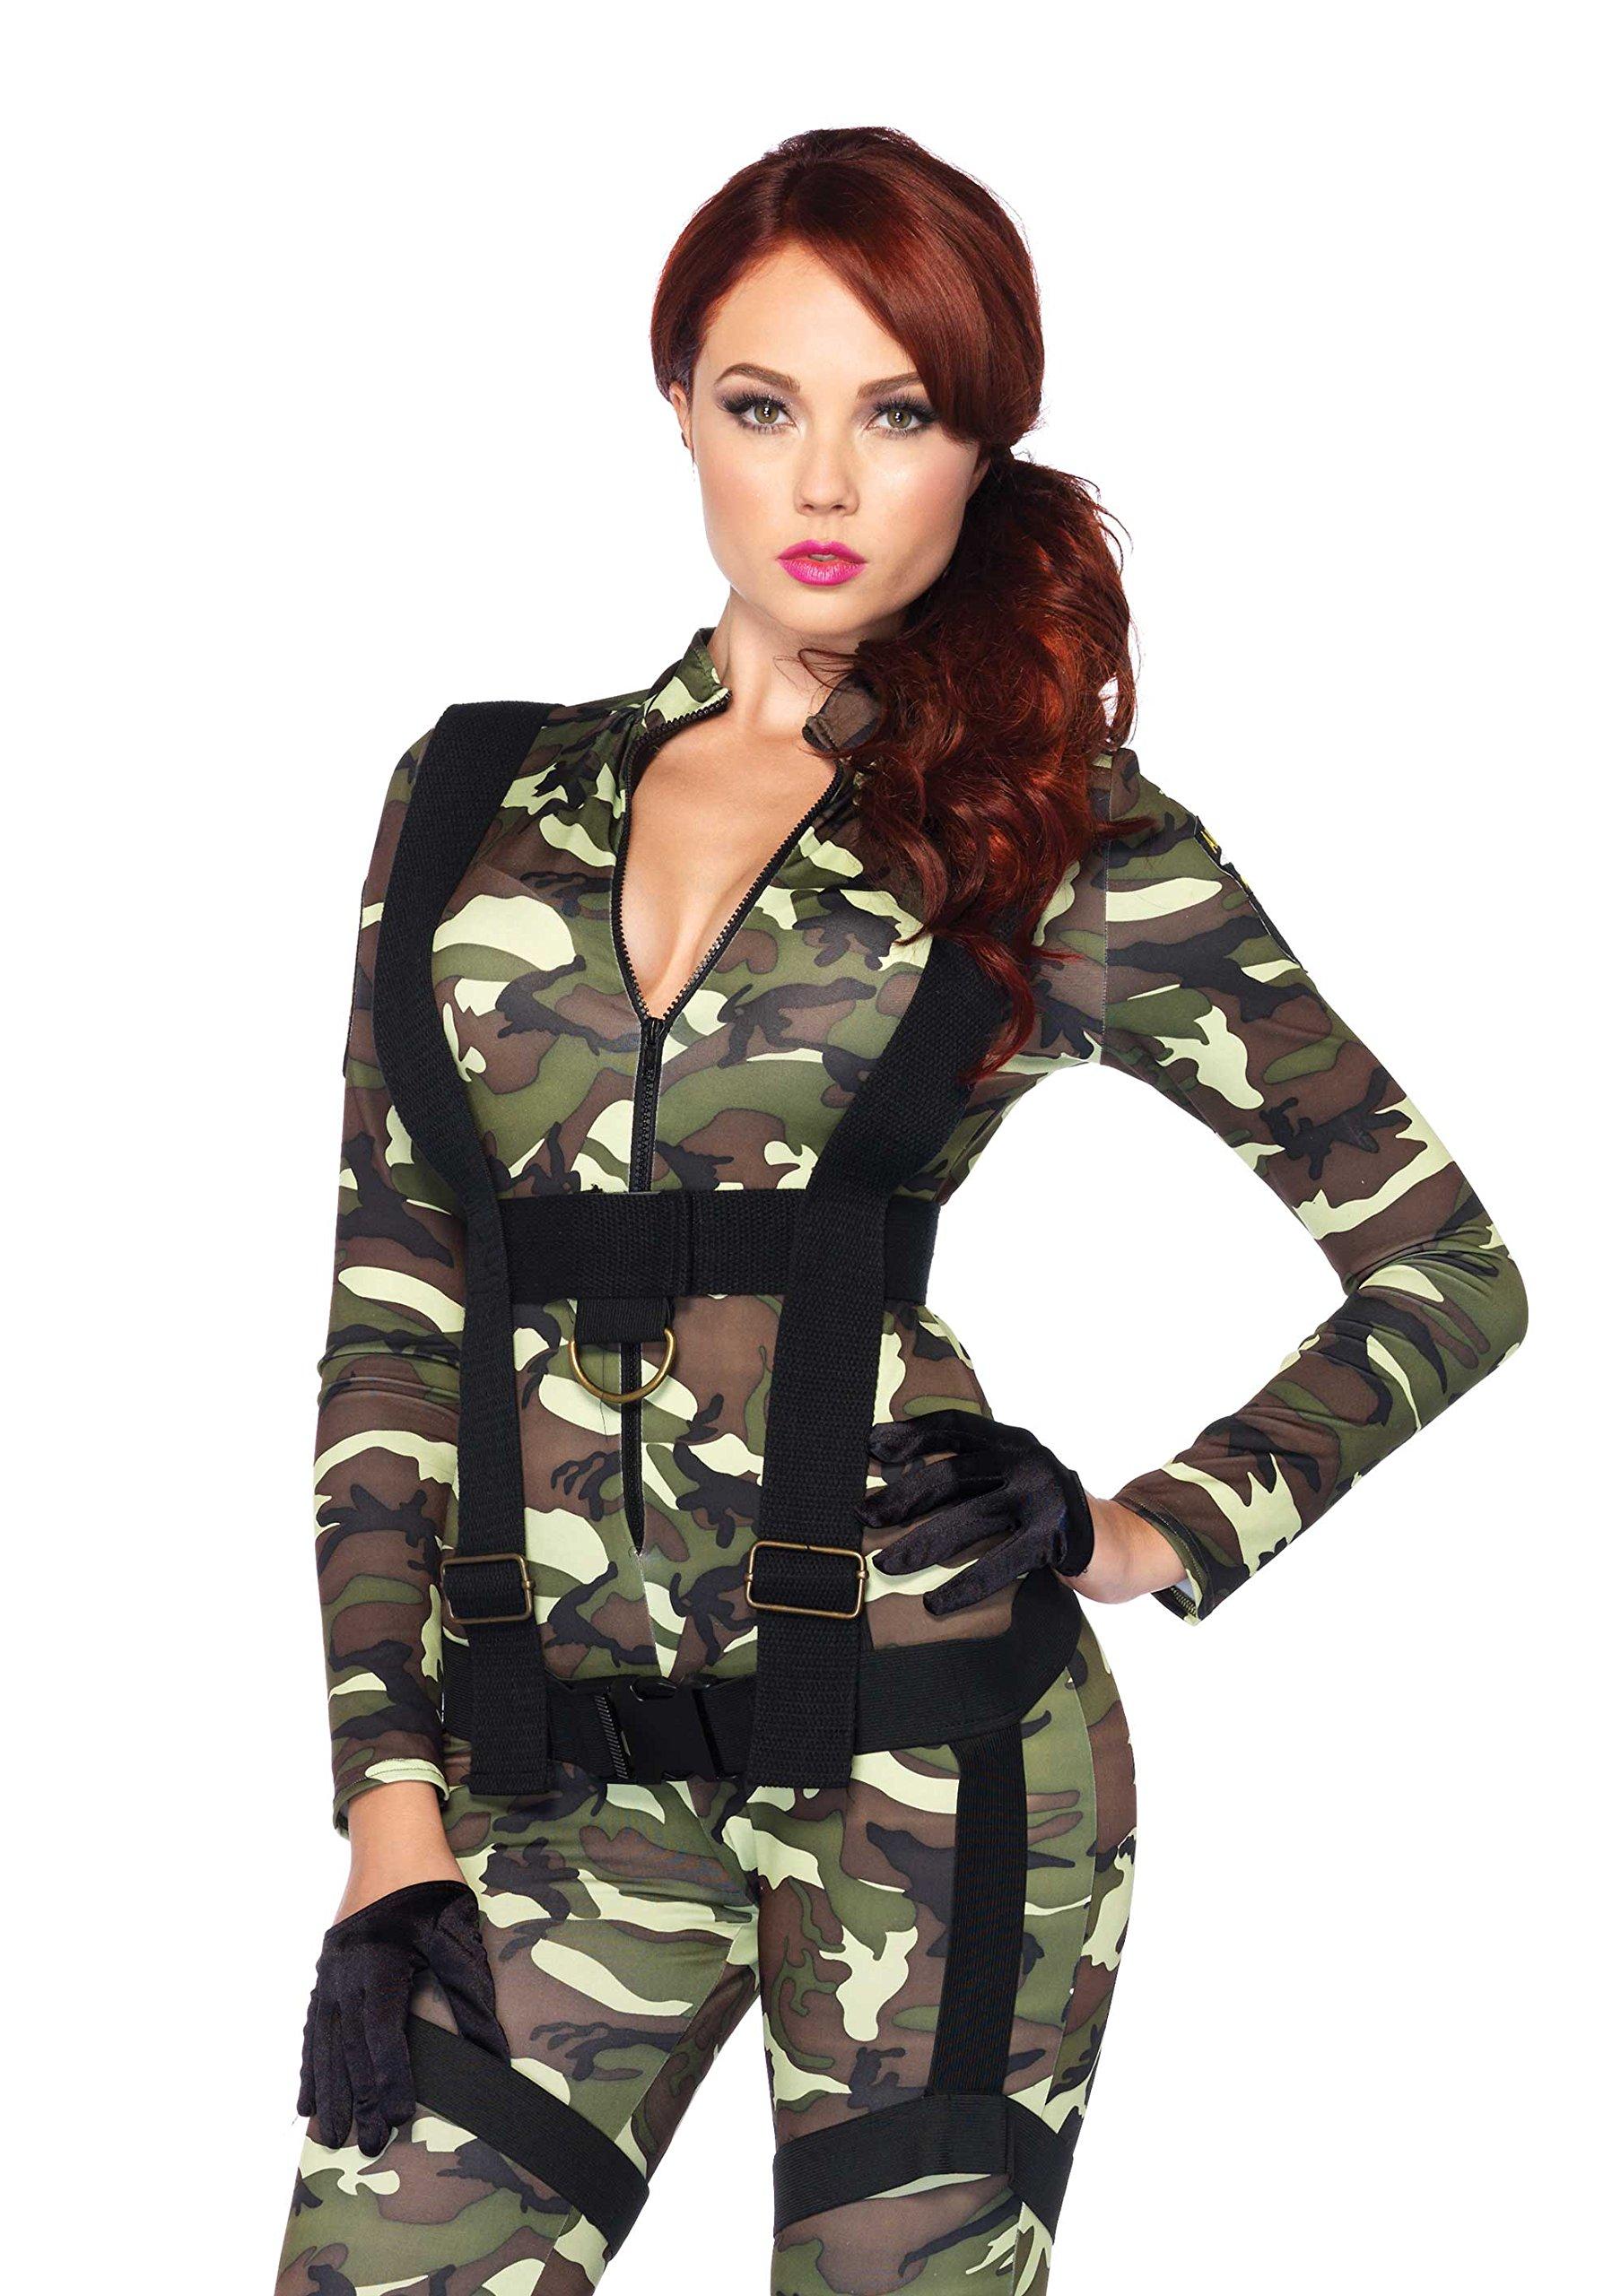 Leg Avenue Women's 2 Piece Pretty Paratrooper Costume, Camo, Medium